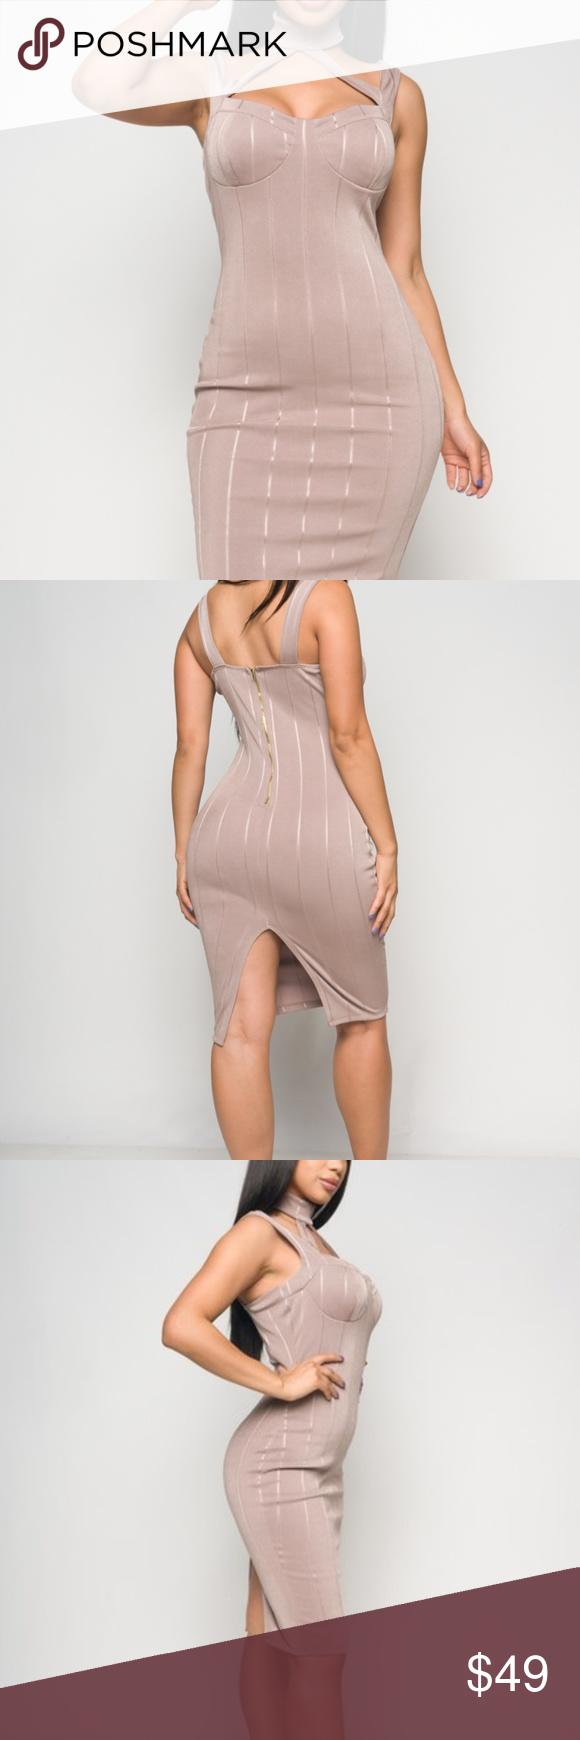 Taupe Midi Dress Boutique Clothes Design Fashion Taupe Midi Dress [ 1740 x 580 Pixel ]